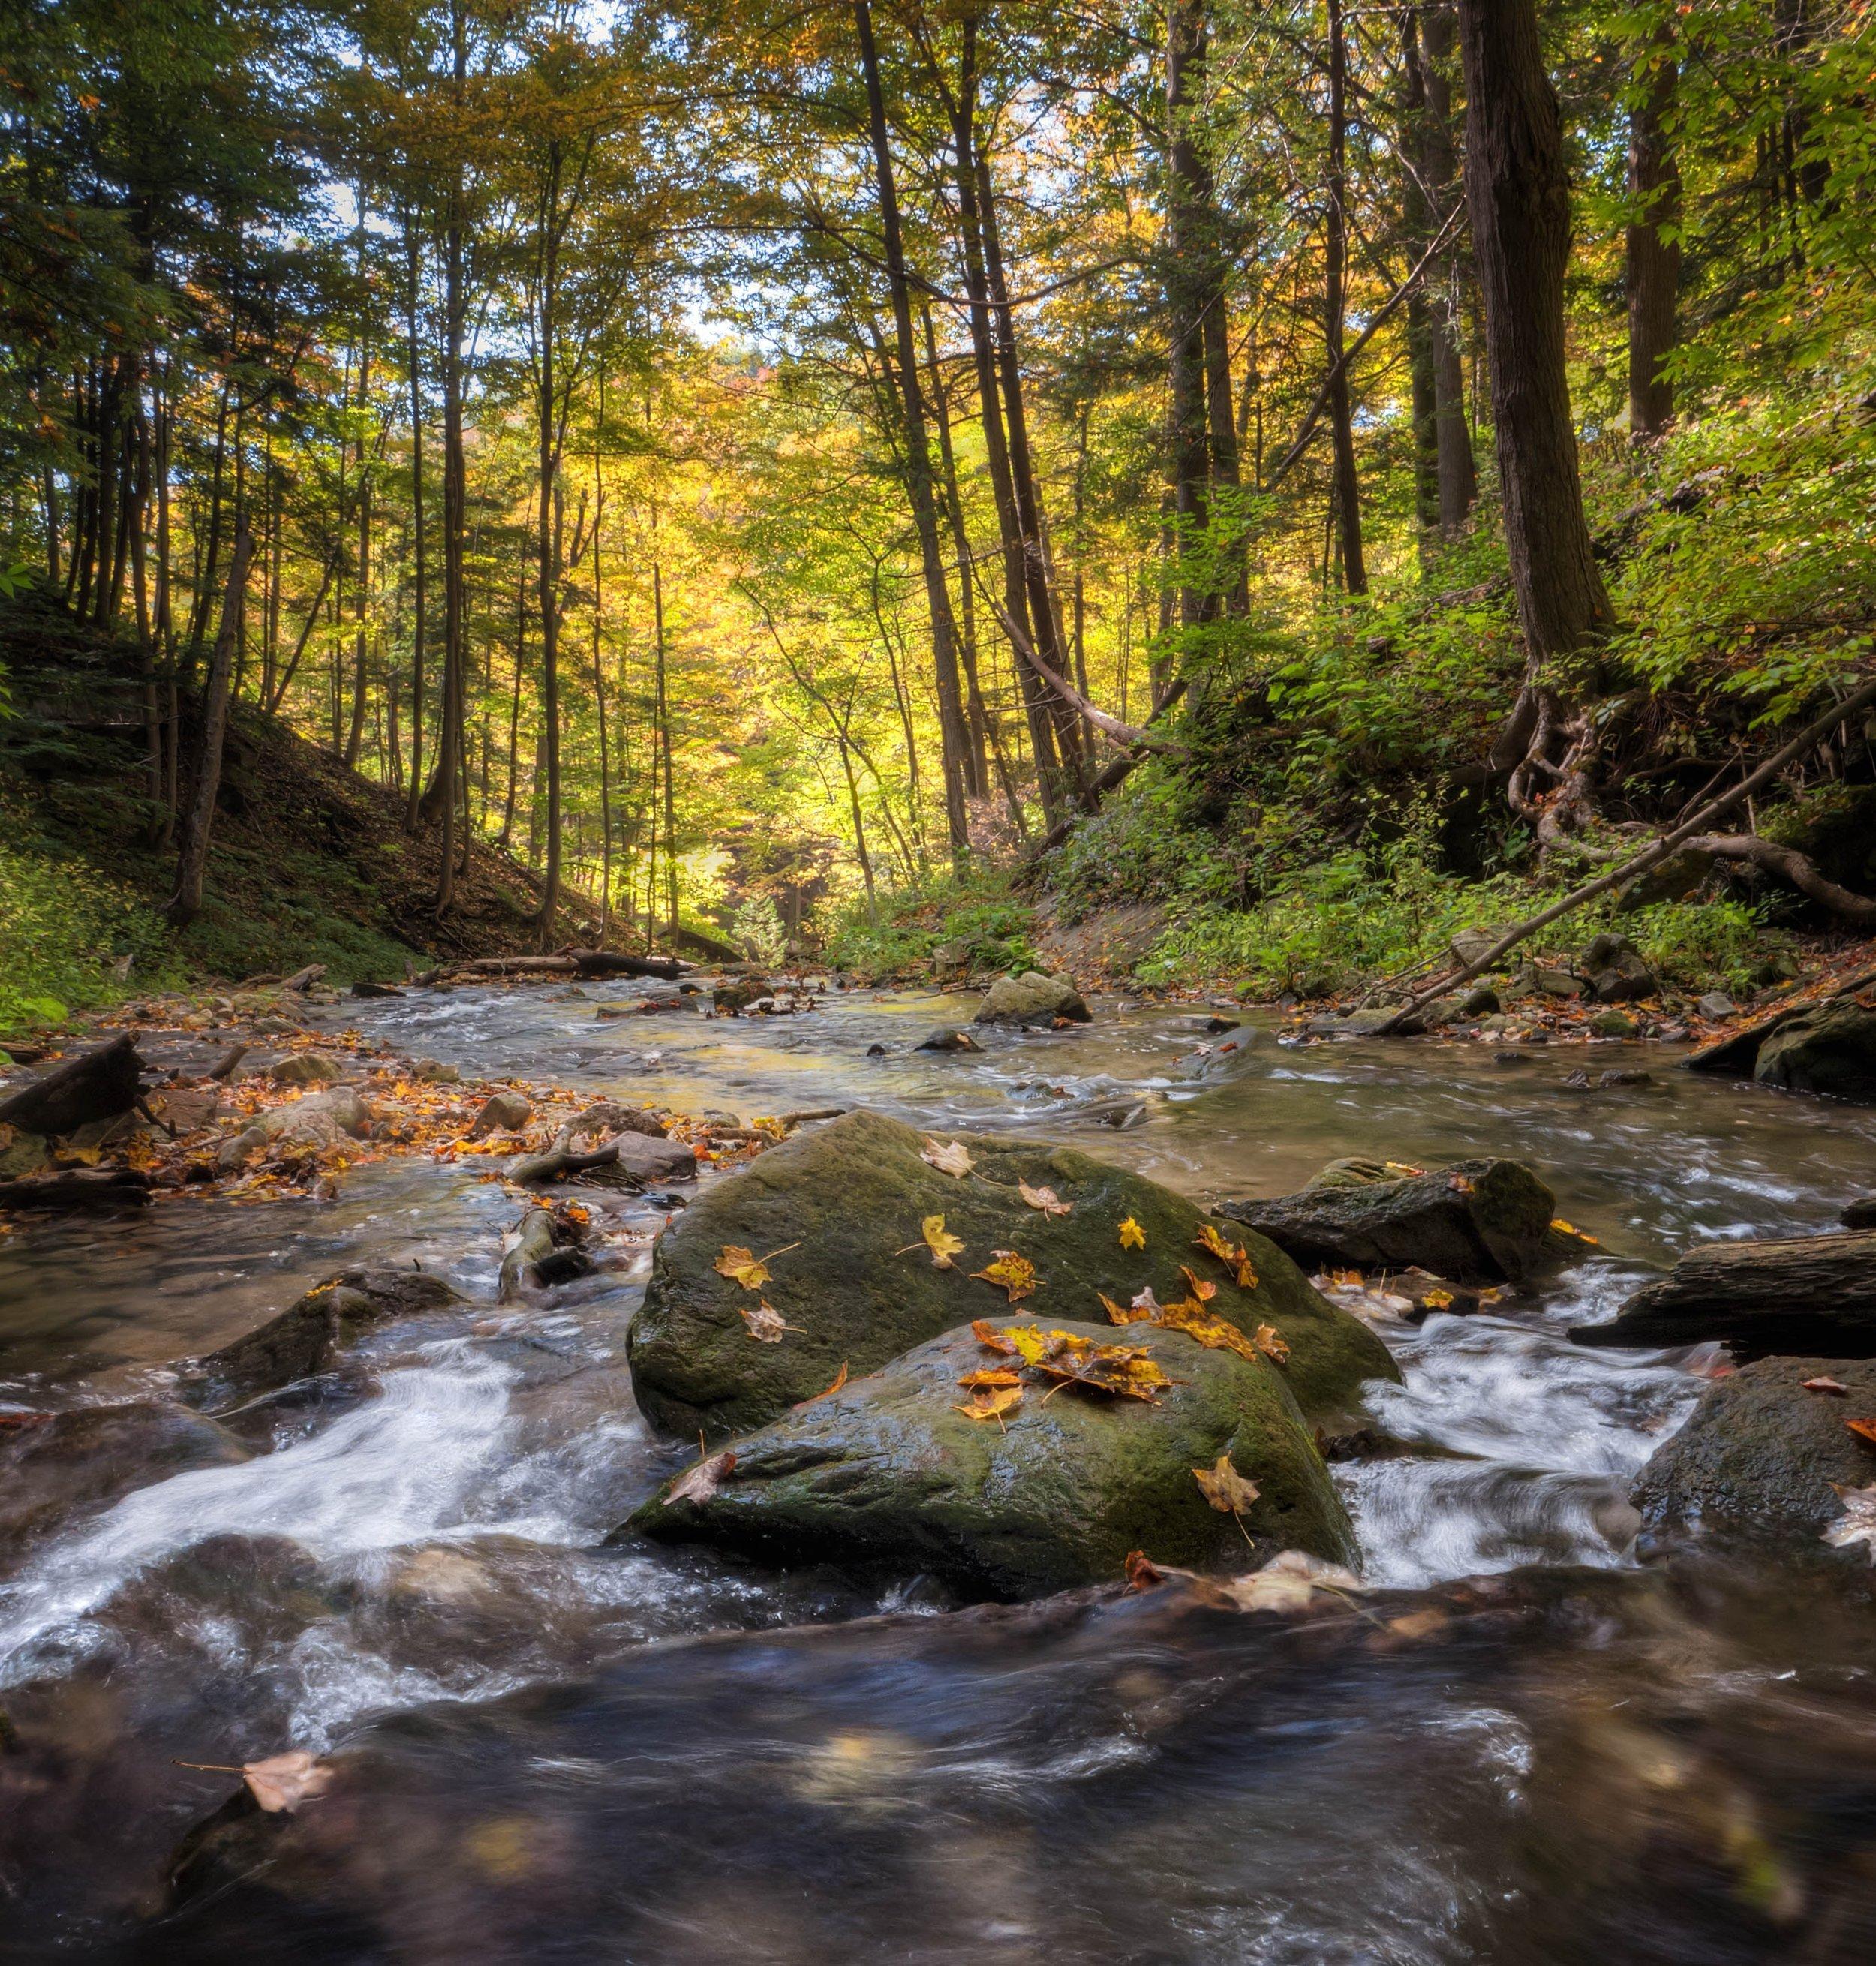 creek-landscape-nature-149609.jpg